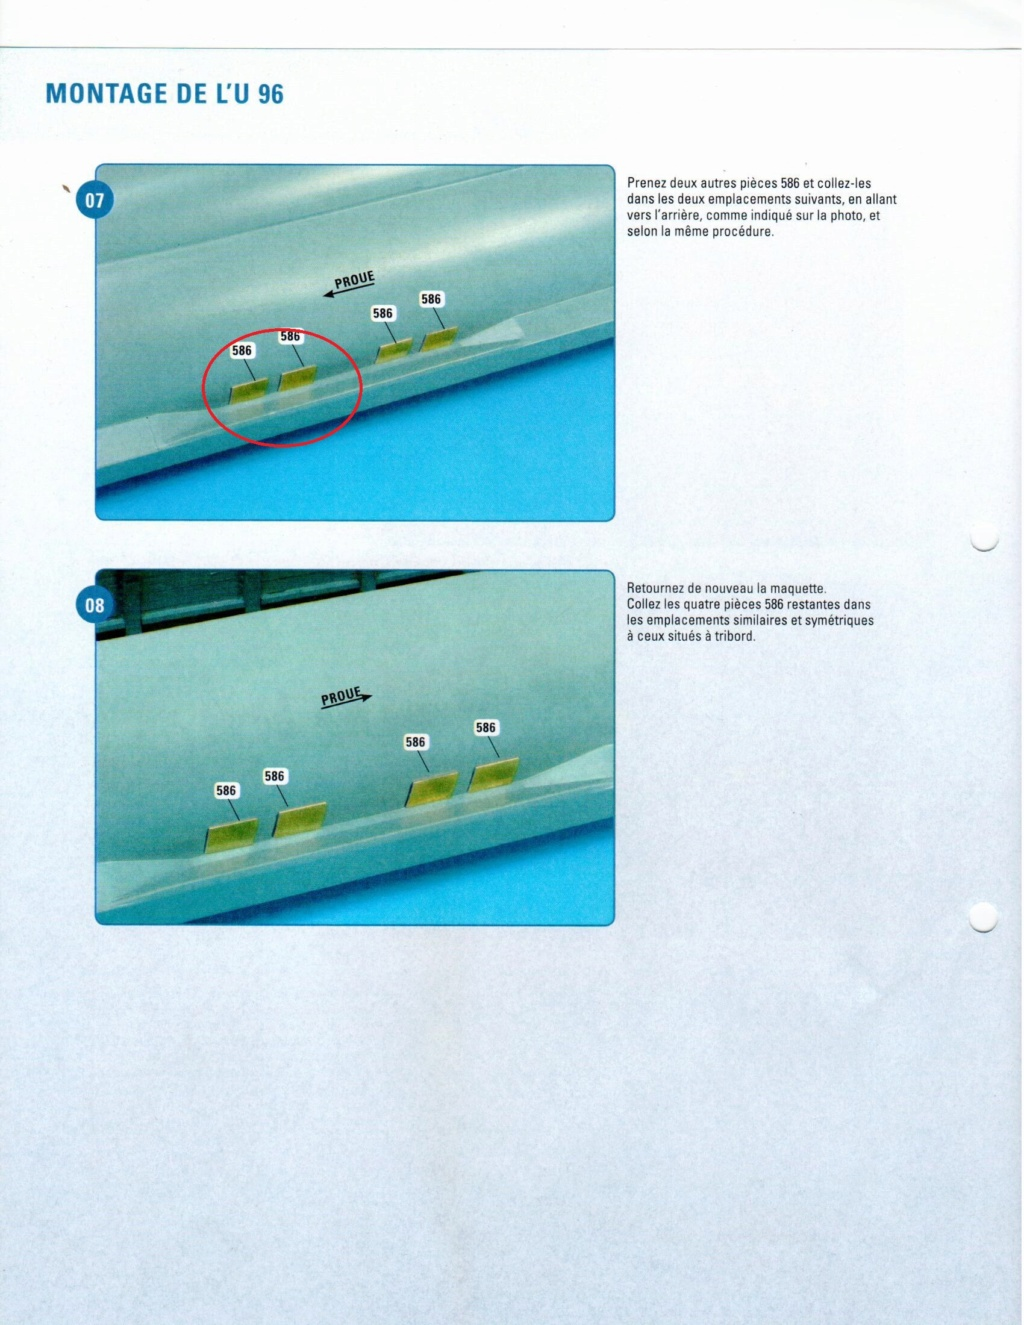 U boat U 96 un sous-marin - Page 4 U9610